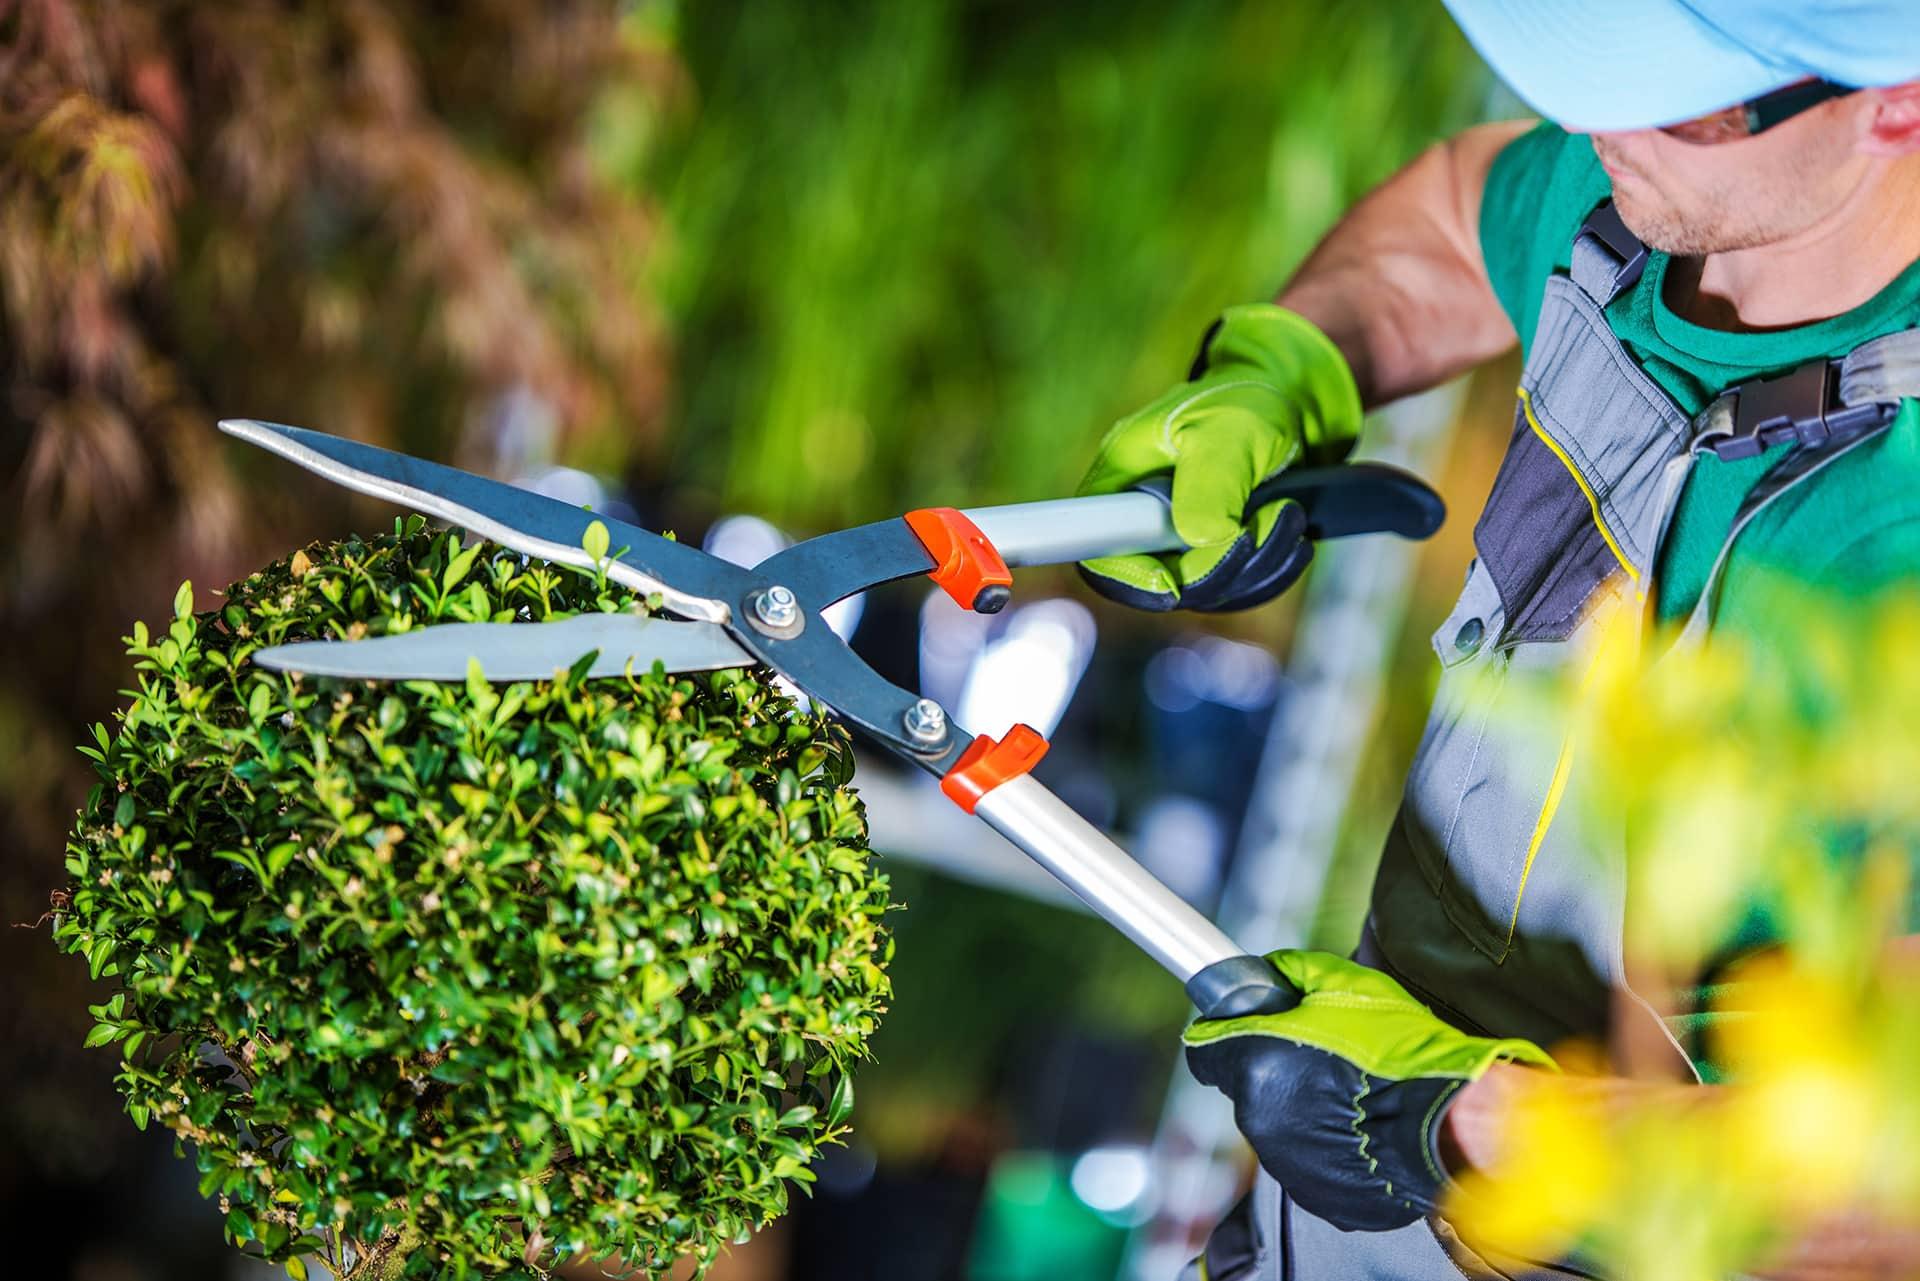 corso manutentore del verde